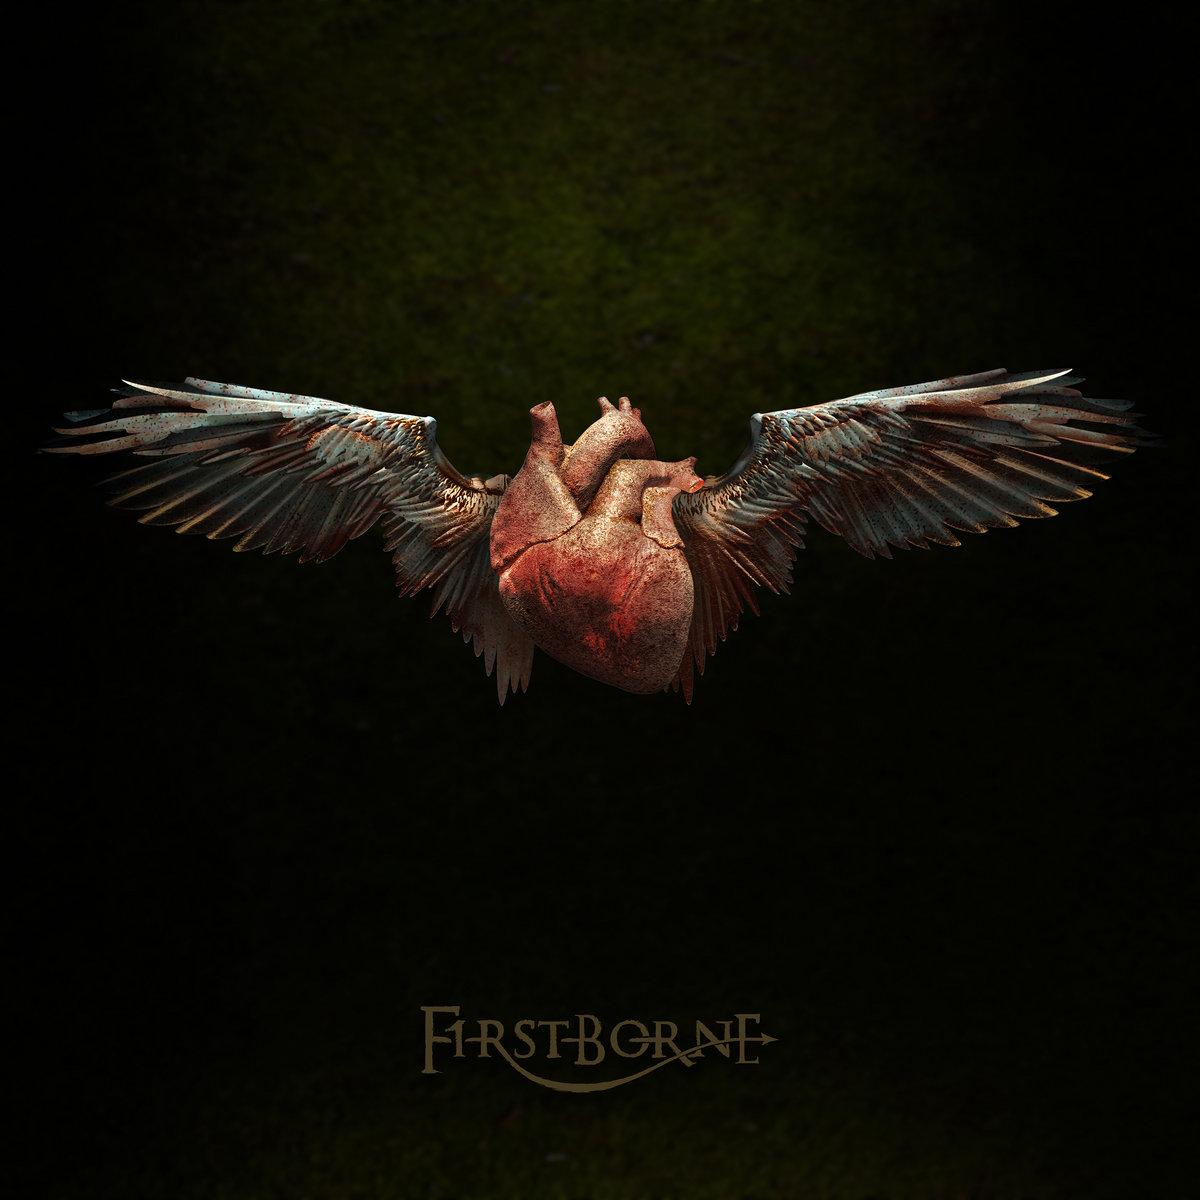 Firstborne EP chris adler myrone james lomenzo girish pradhan - mega-depth